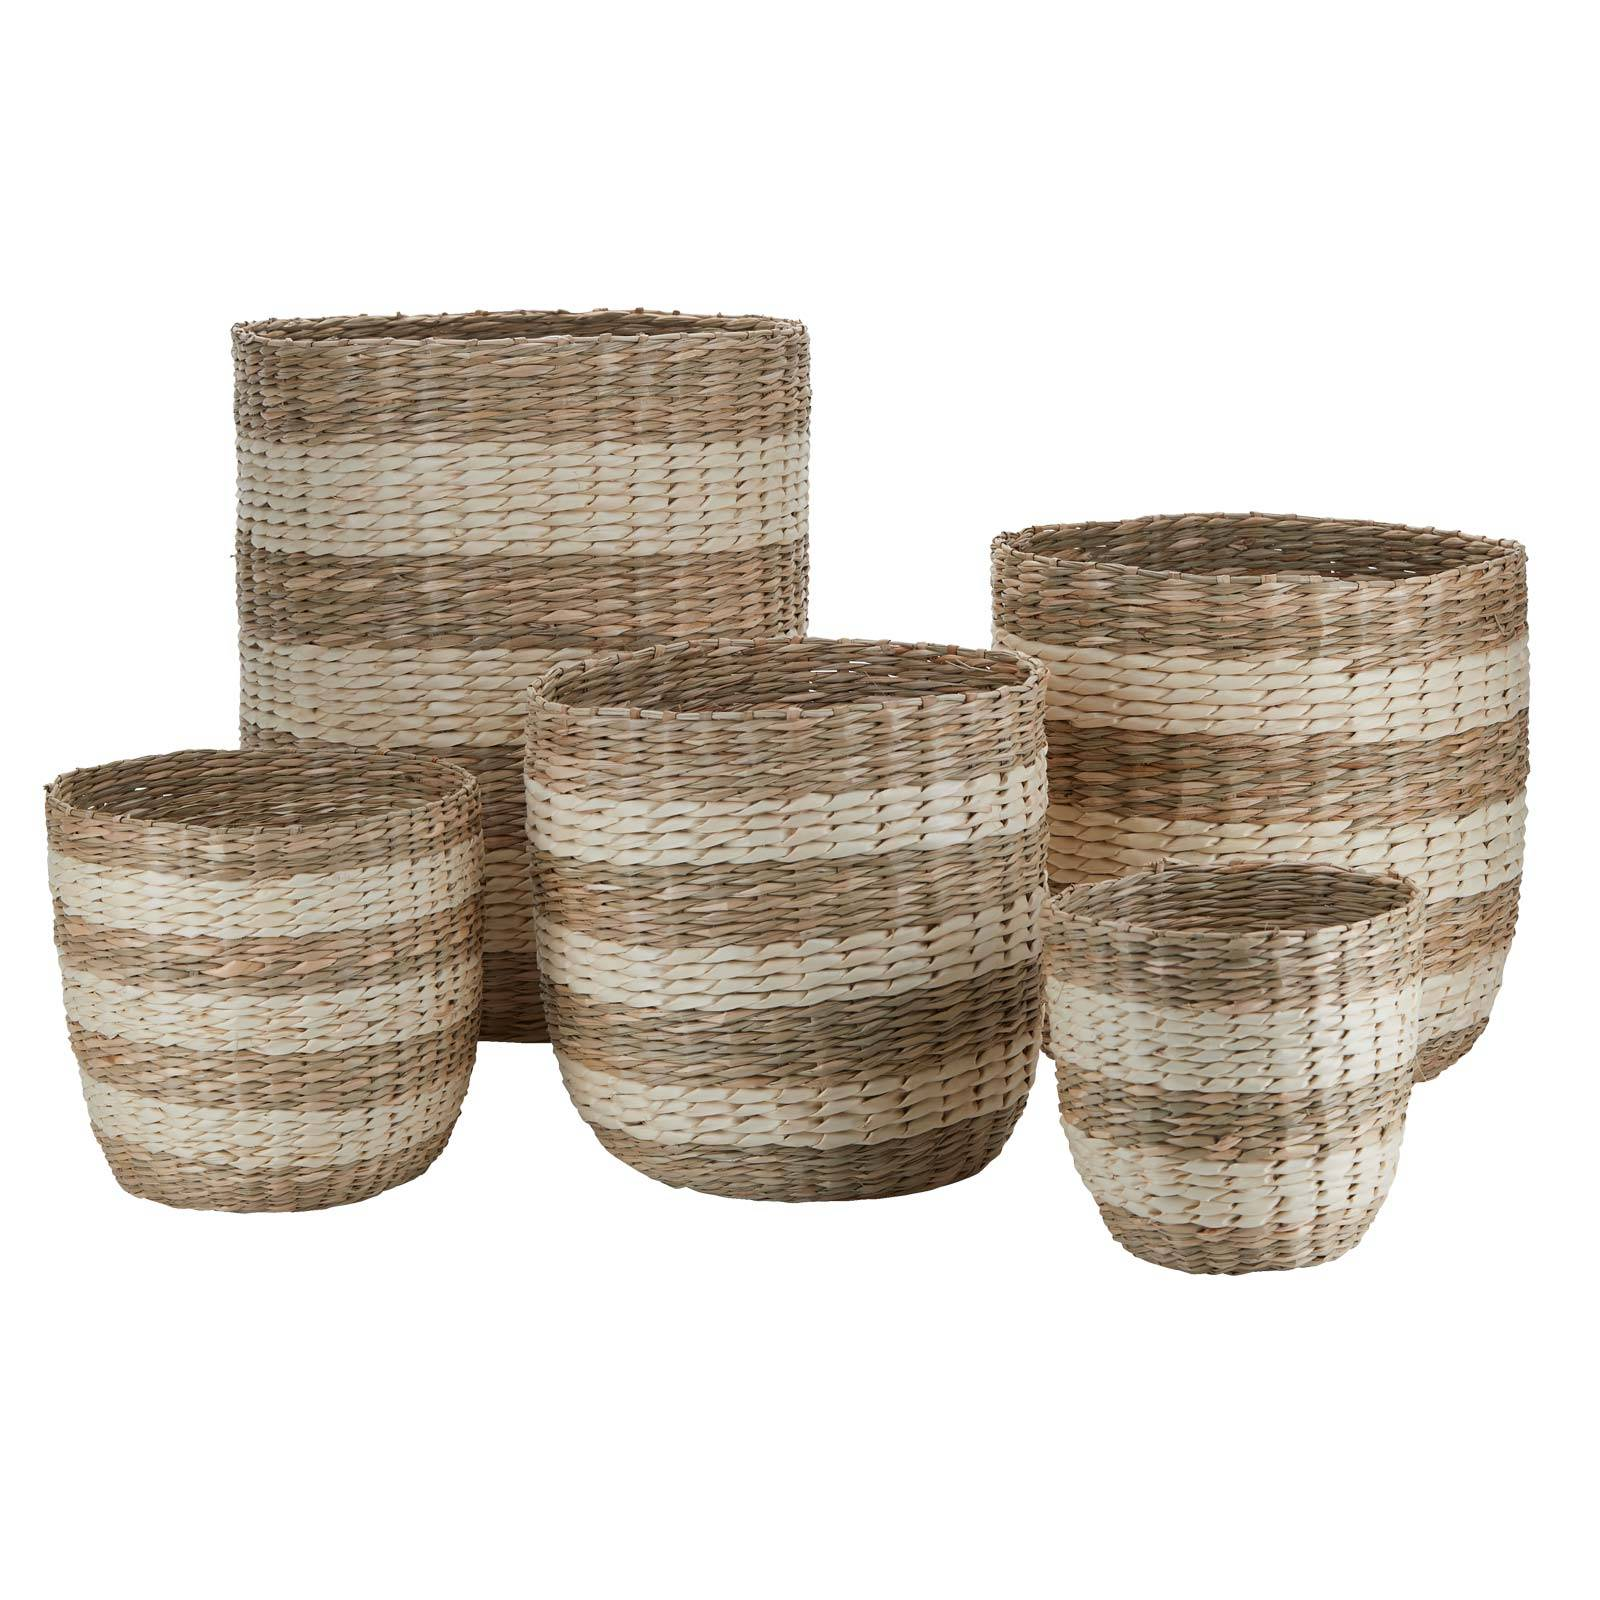 Large Striped Two Tone Striped Basket H:23cm